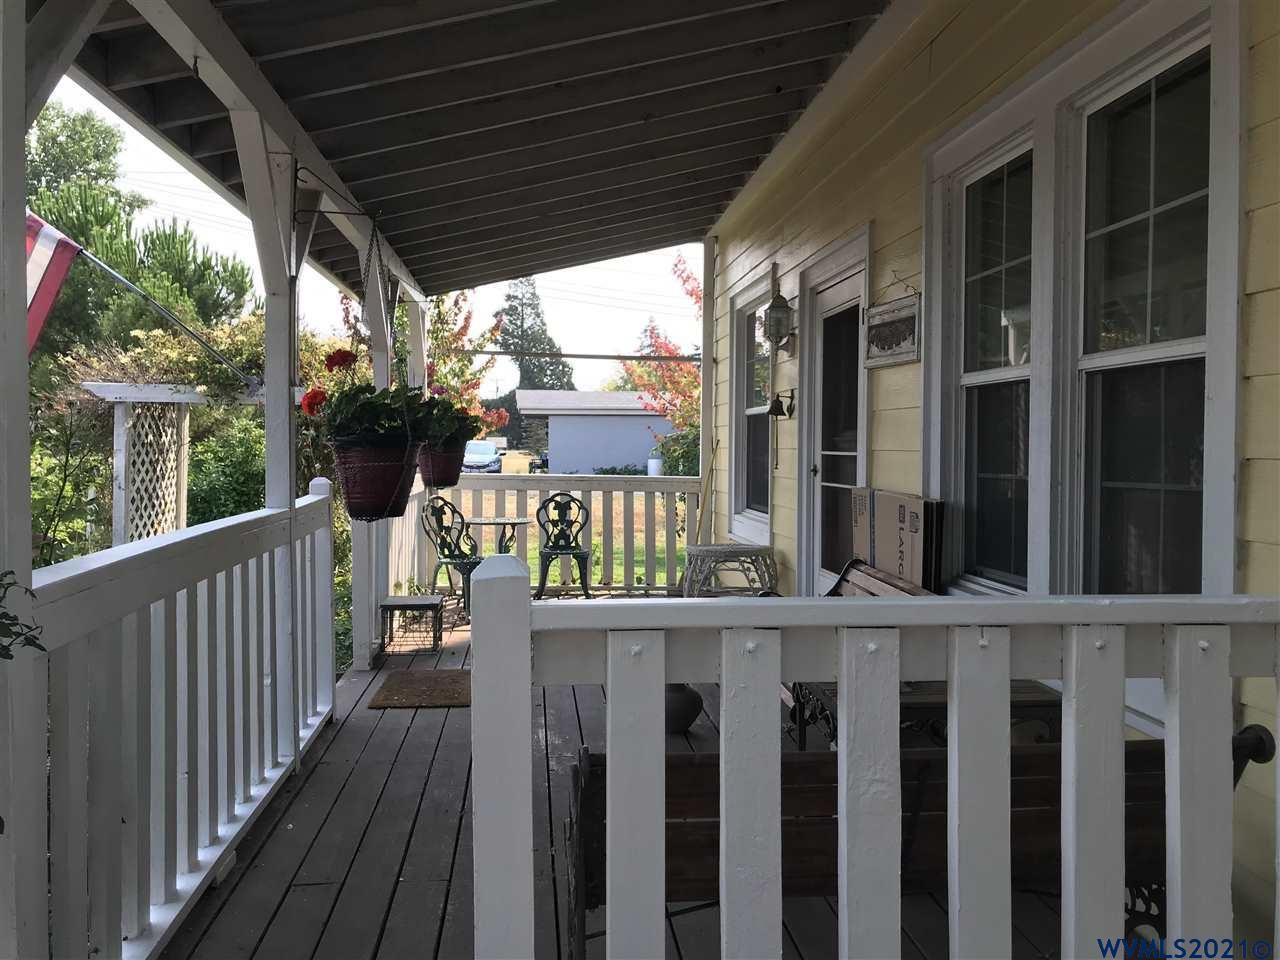 Photo of 1024 W Main St, Sheridan, OR 97378 (MLS # 782218)